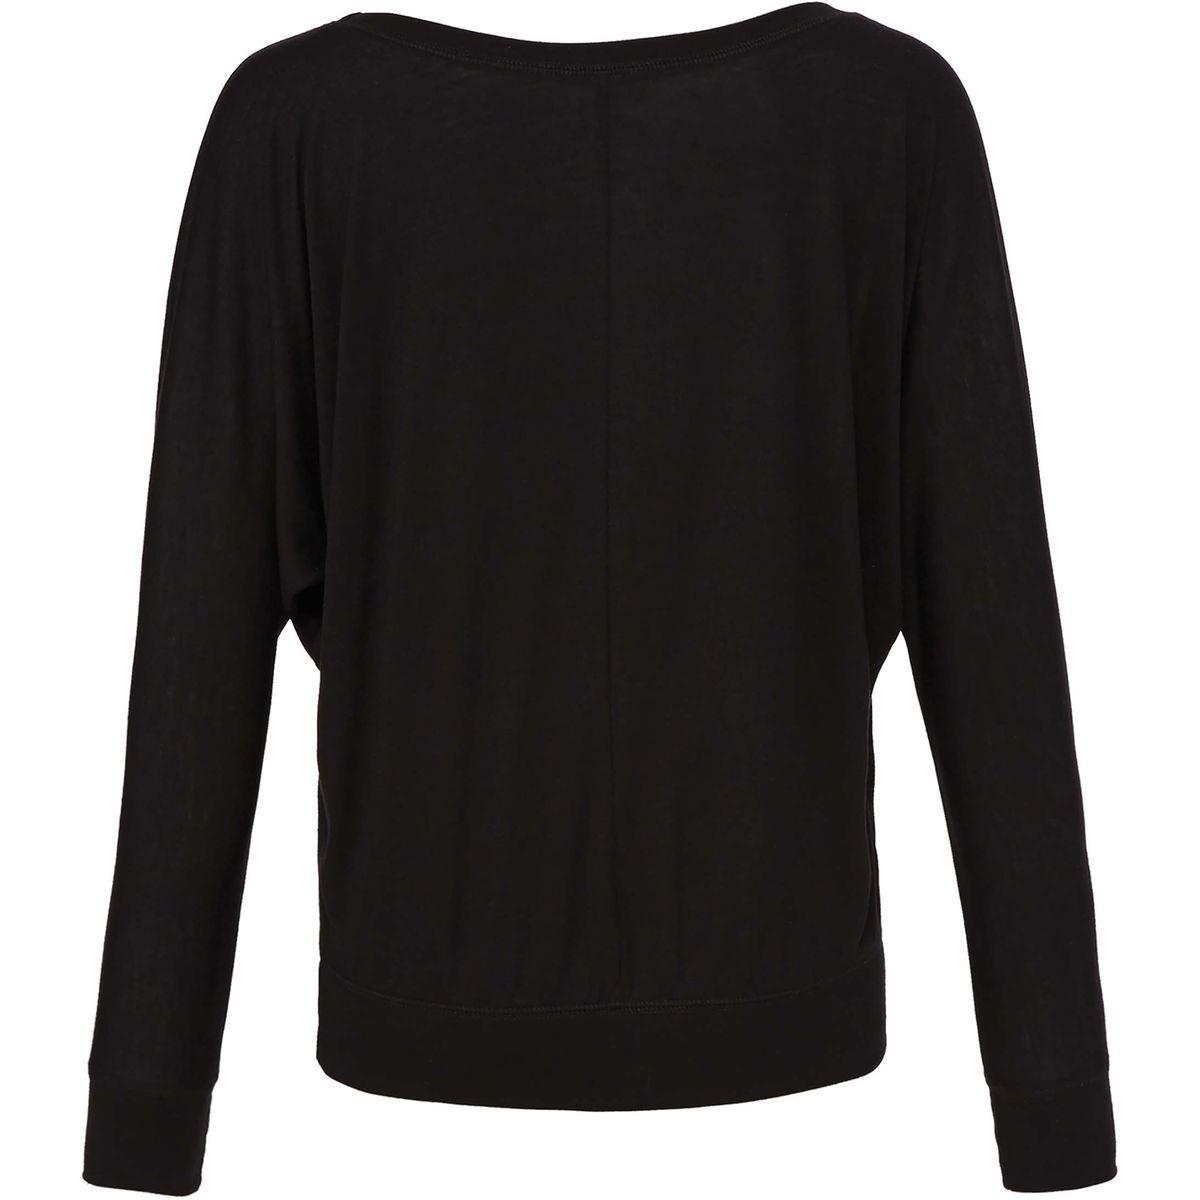 T-shirt flowy manches longues encolure large